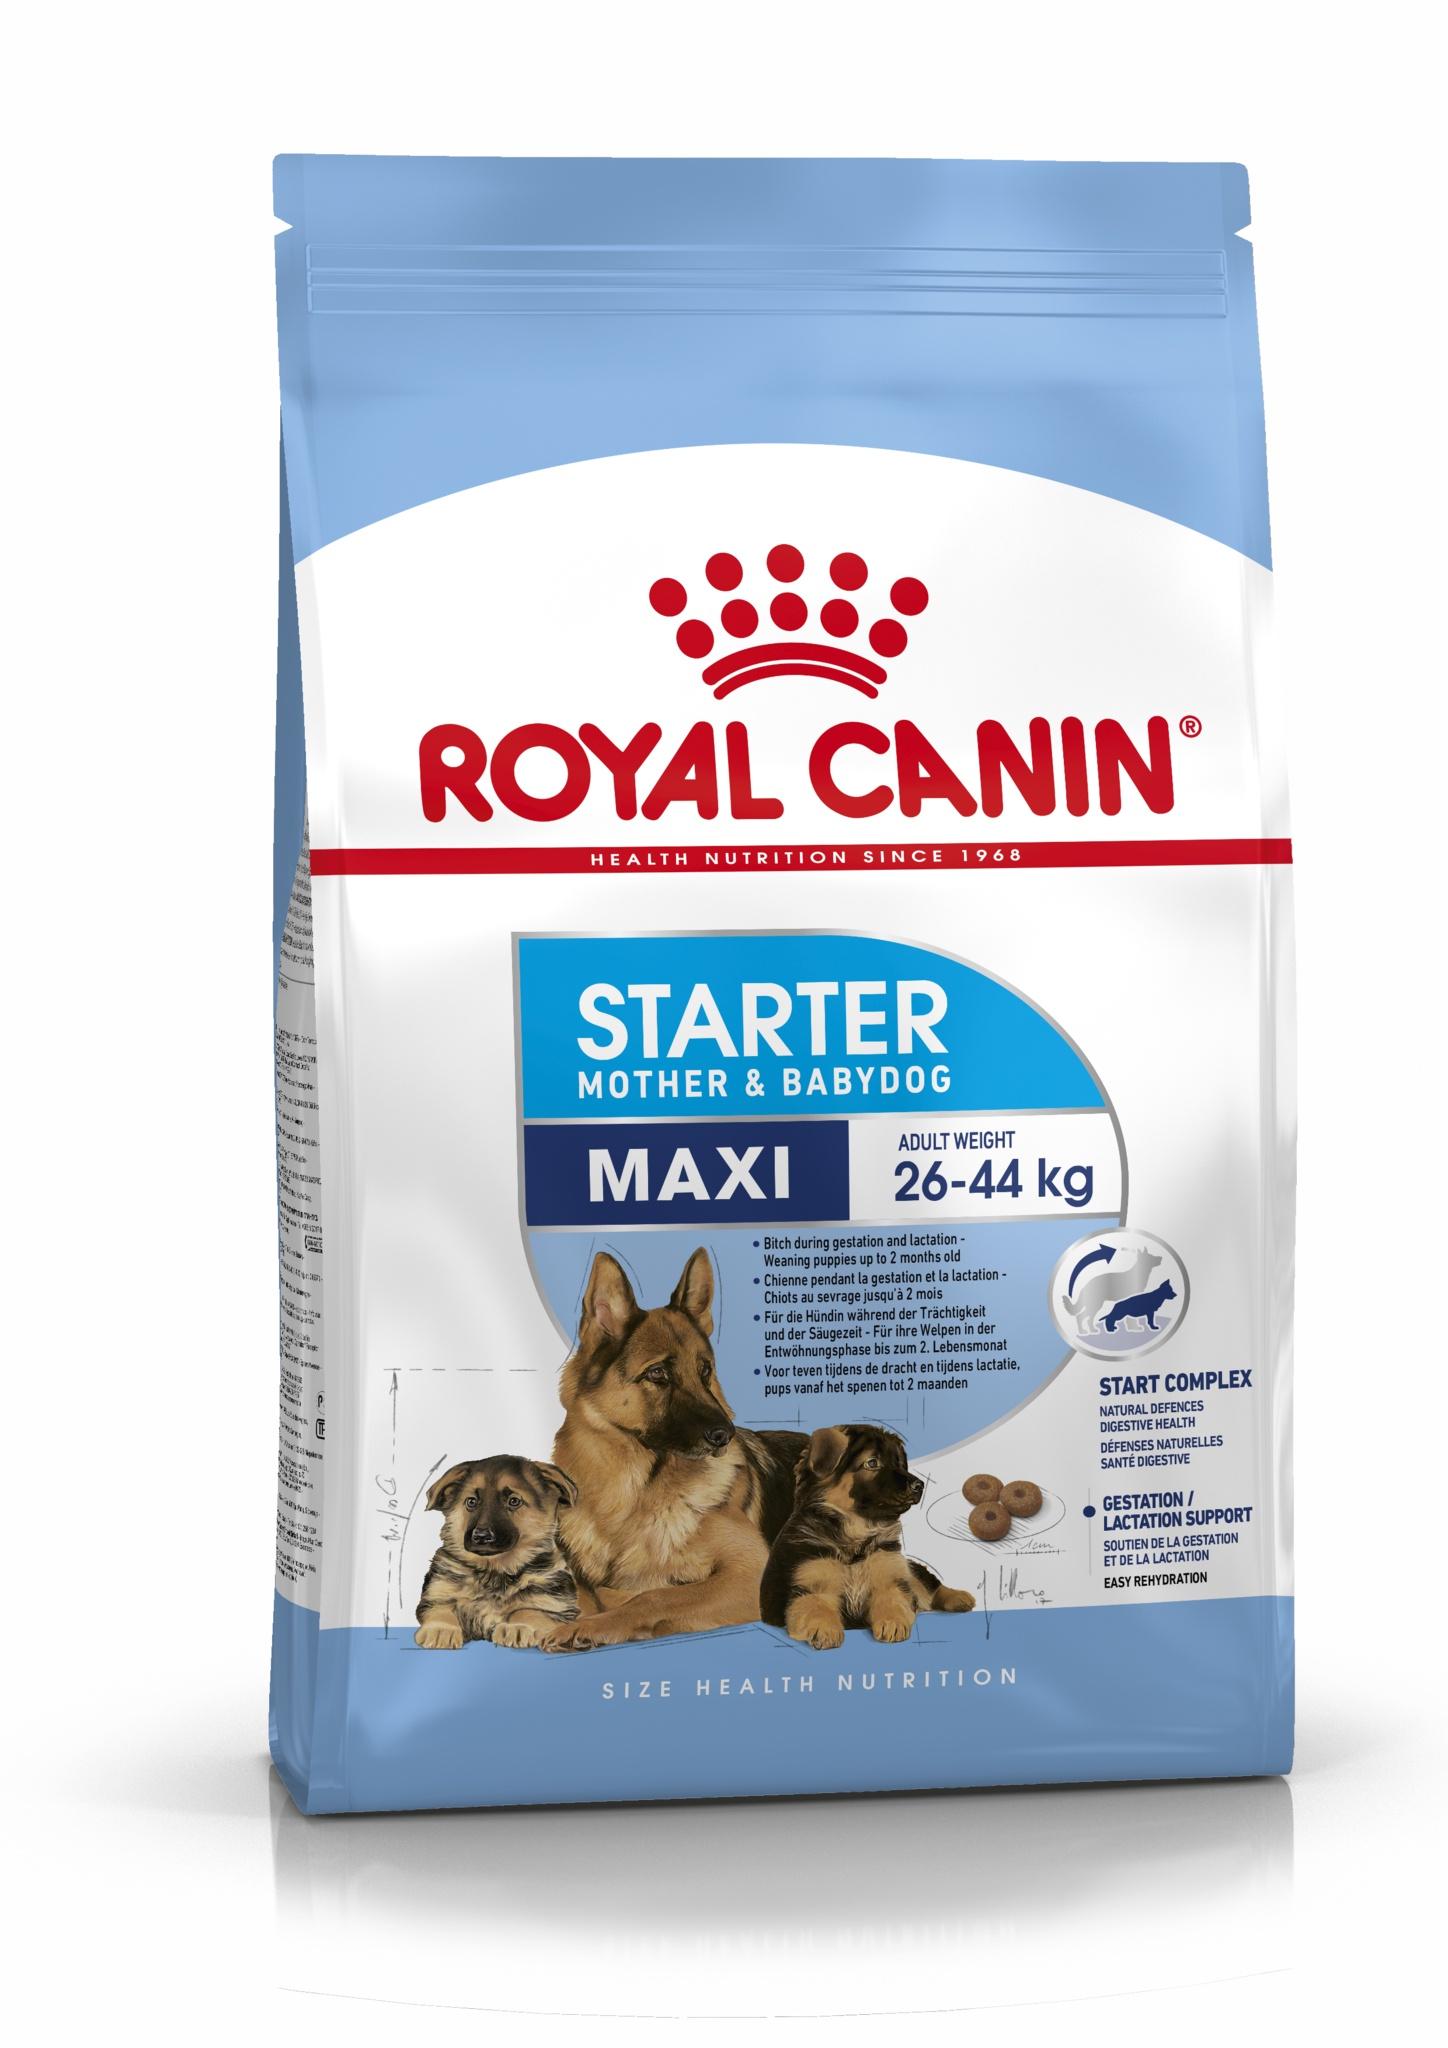 Royal Canin корм для щенков крупных пород до 2-х месяцев (4 кг) royal canin корм для щенков крупных пород 3 кг